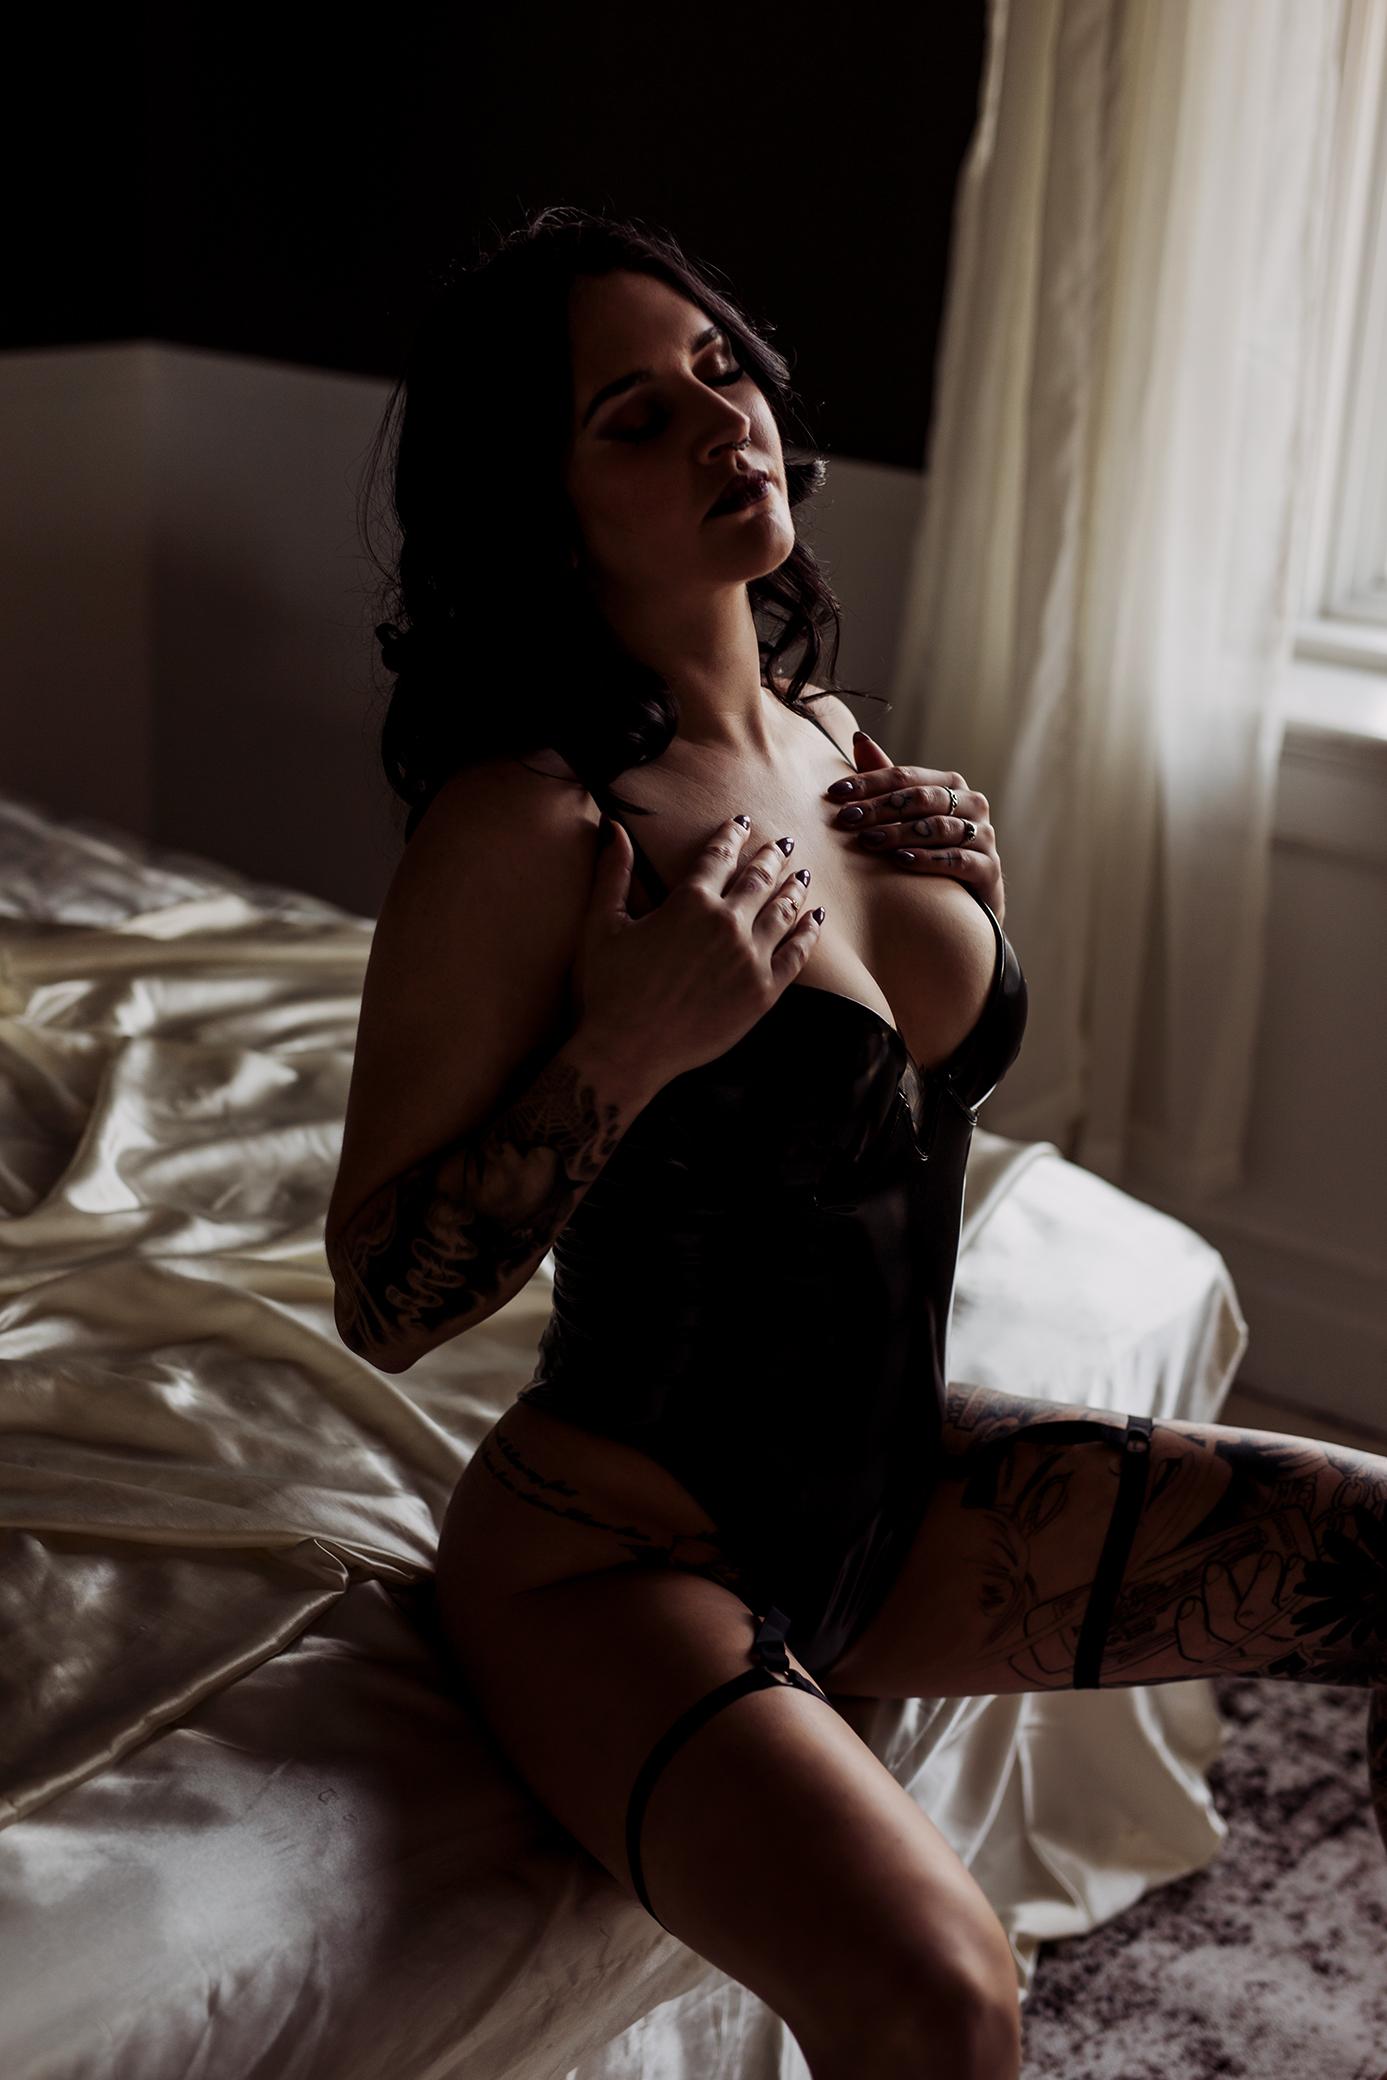 Victoria-BC-Boudoir-Photography-9.jpg